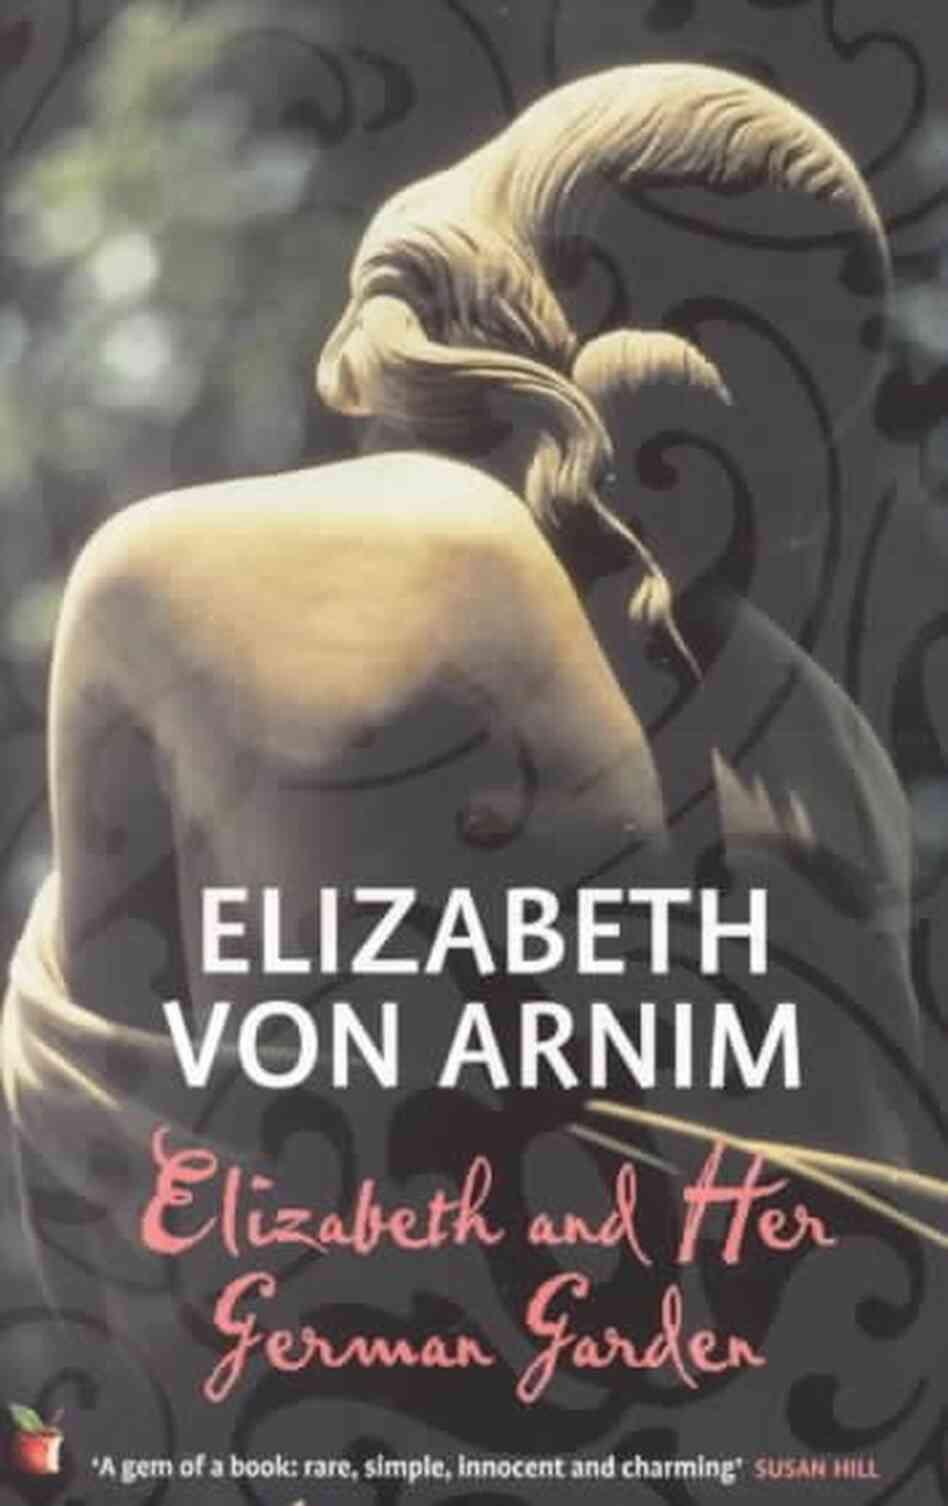 http://media.npr.org/assets/bakertaylor/covers/e/elizabeth-and-her-german-garden/9780860684237_custom-78c1607f6579f60ac827d905aabe43940a58f960-s6-c30.jpg